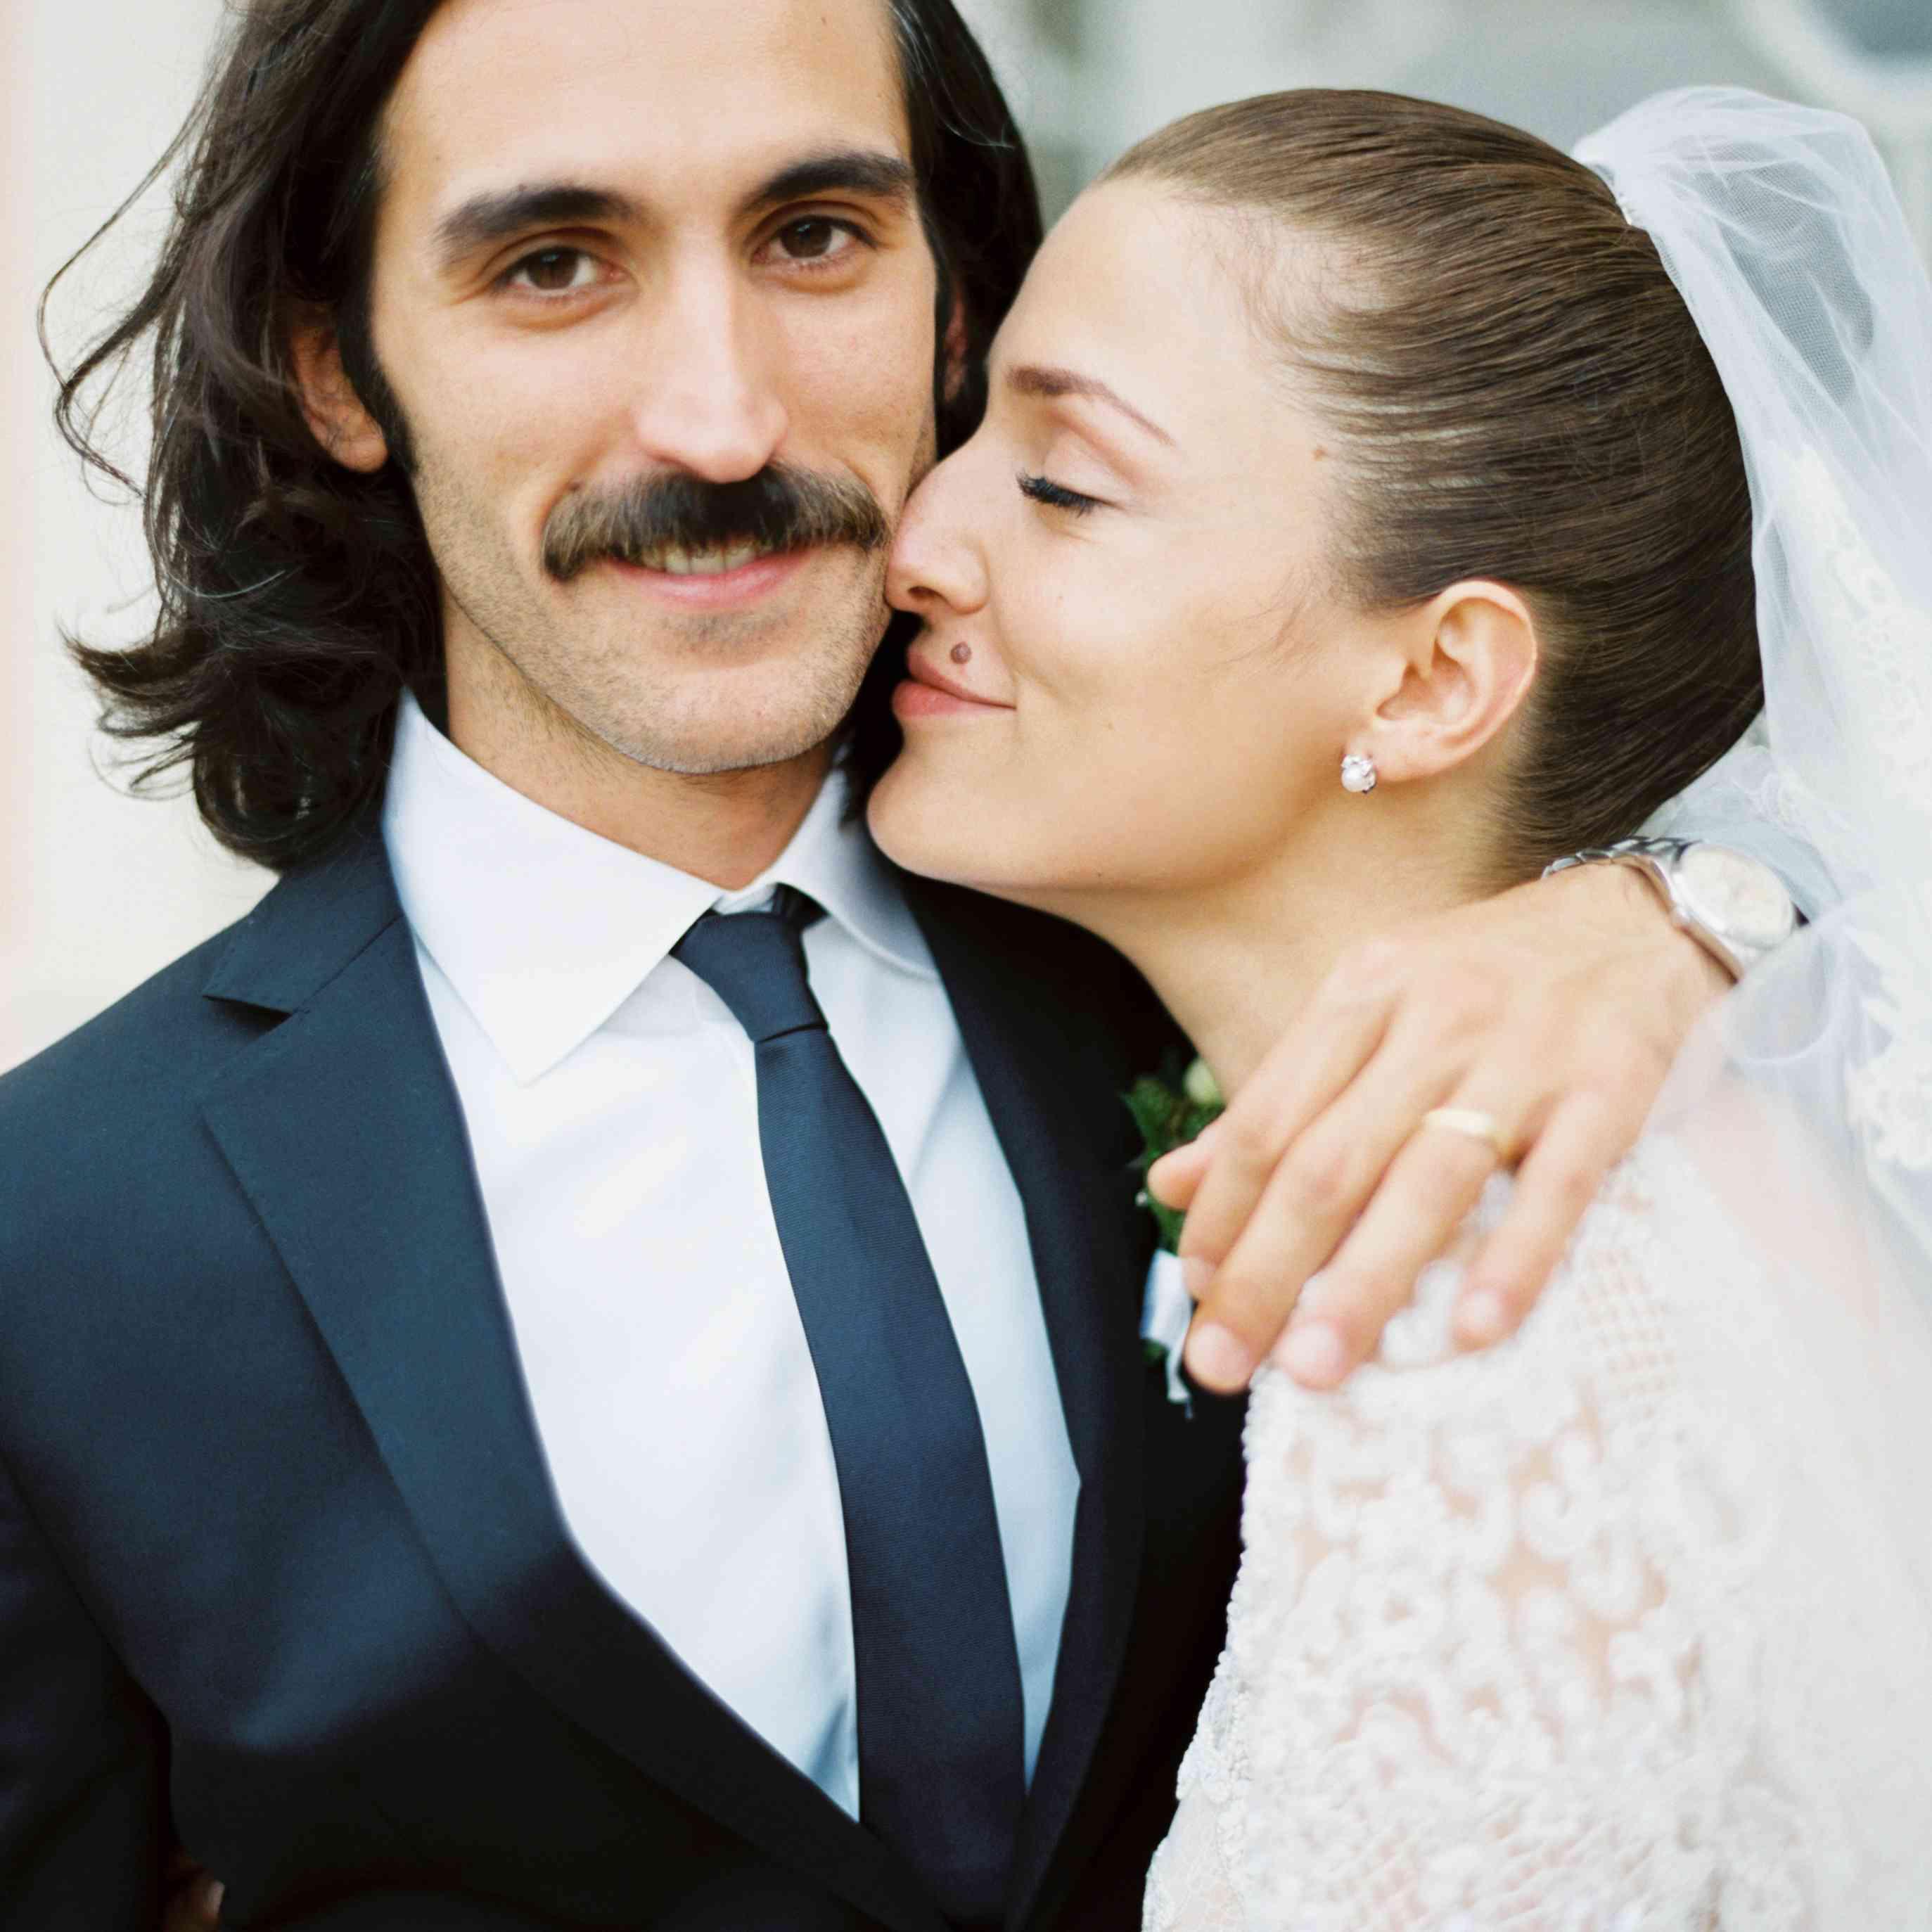 Northern Italian Wedding, Bride and Groom